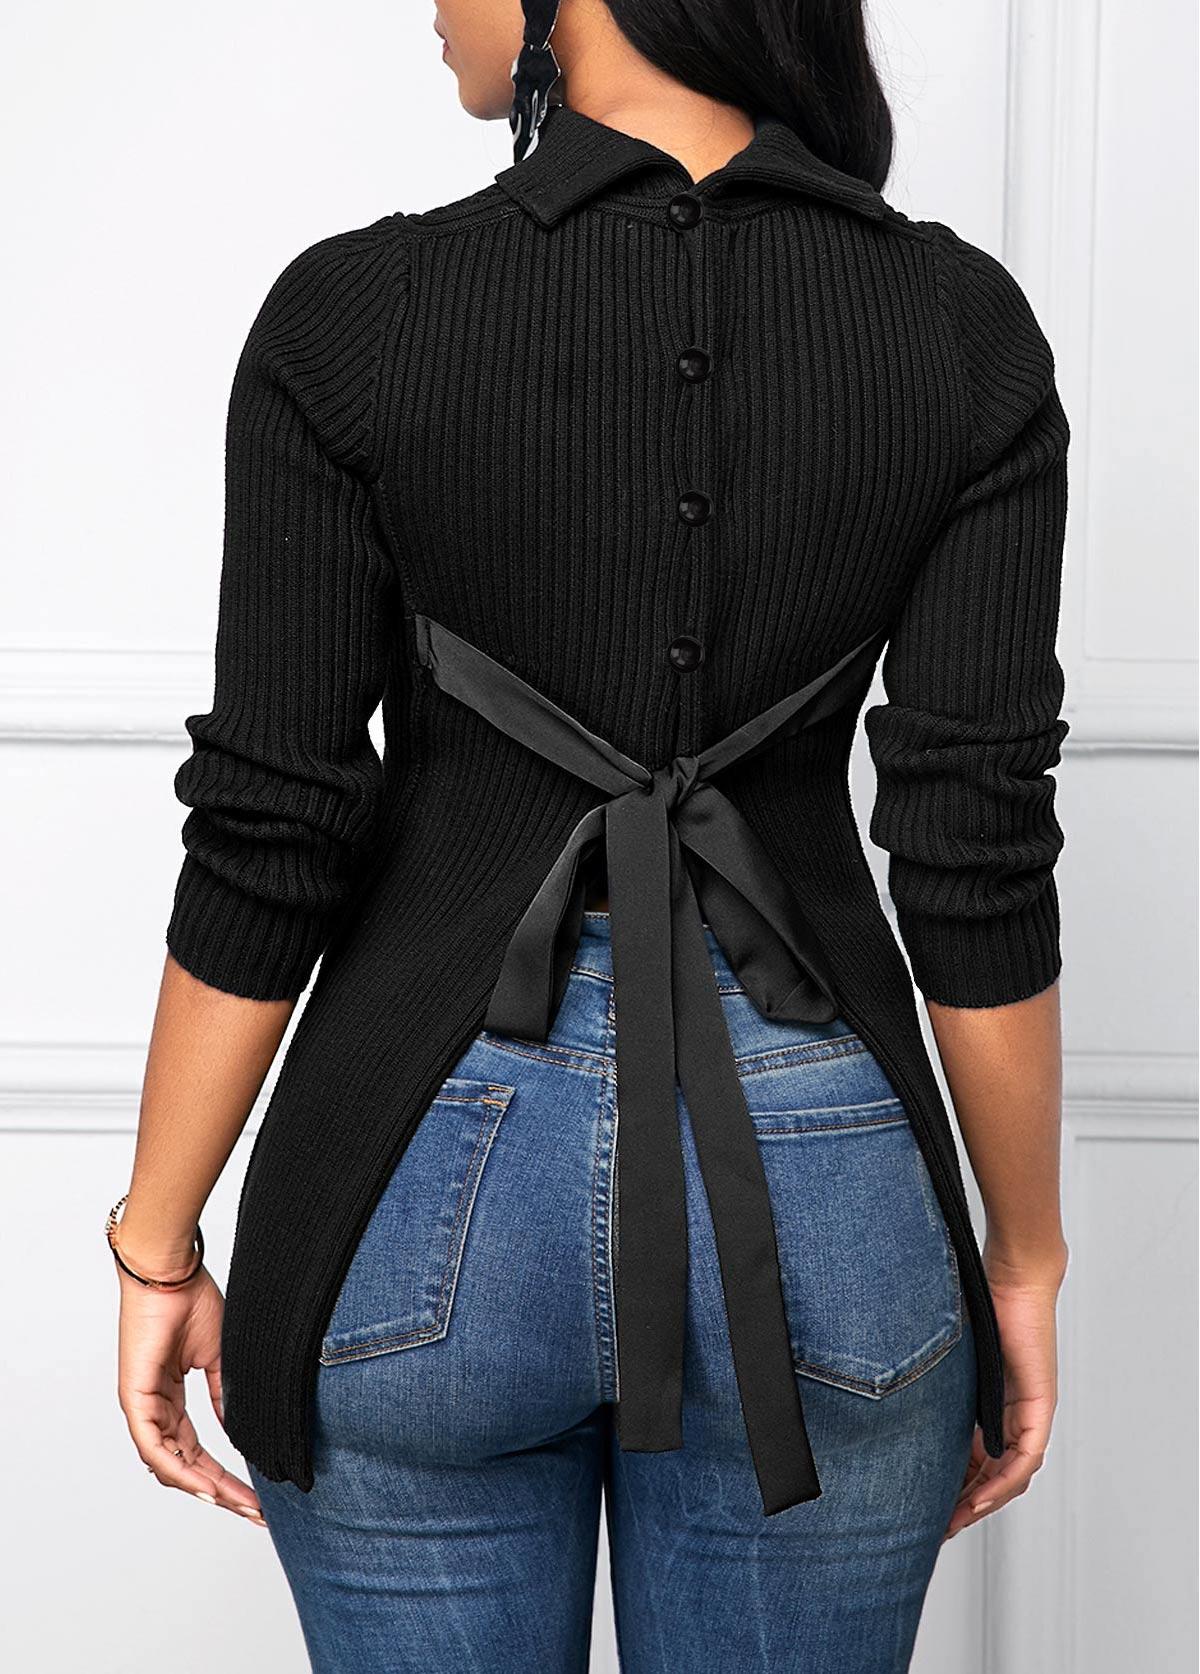 ROTITA Tie Back Black Button Decorated Sweater